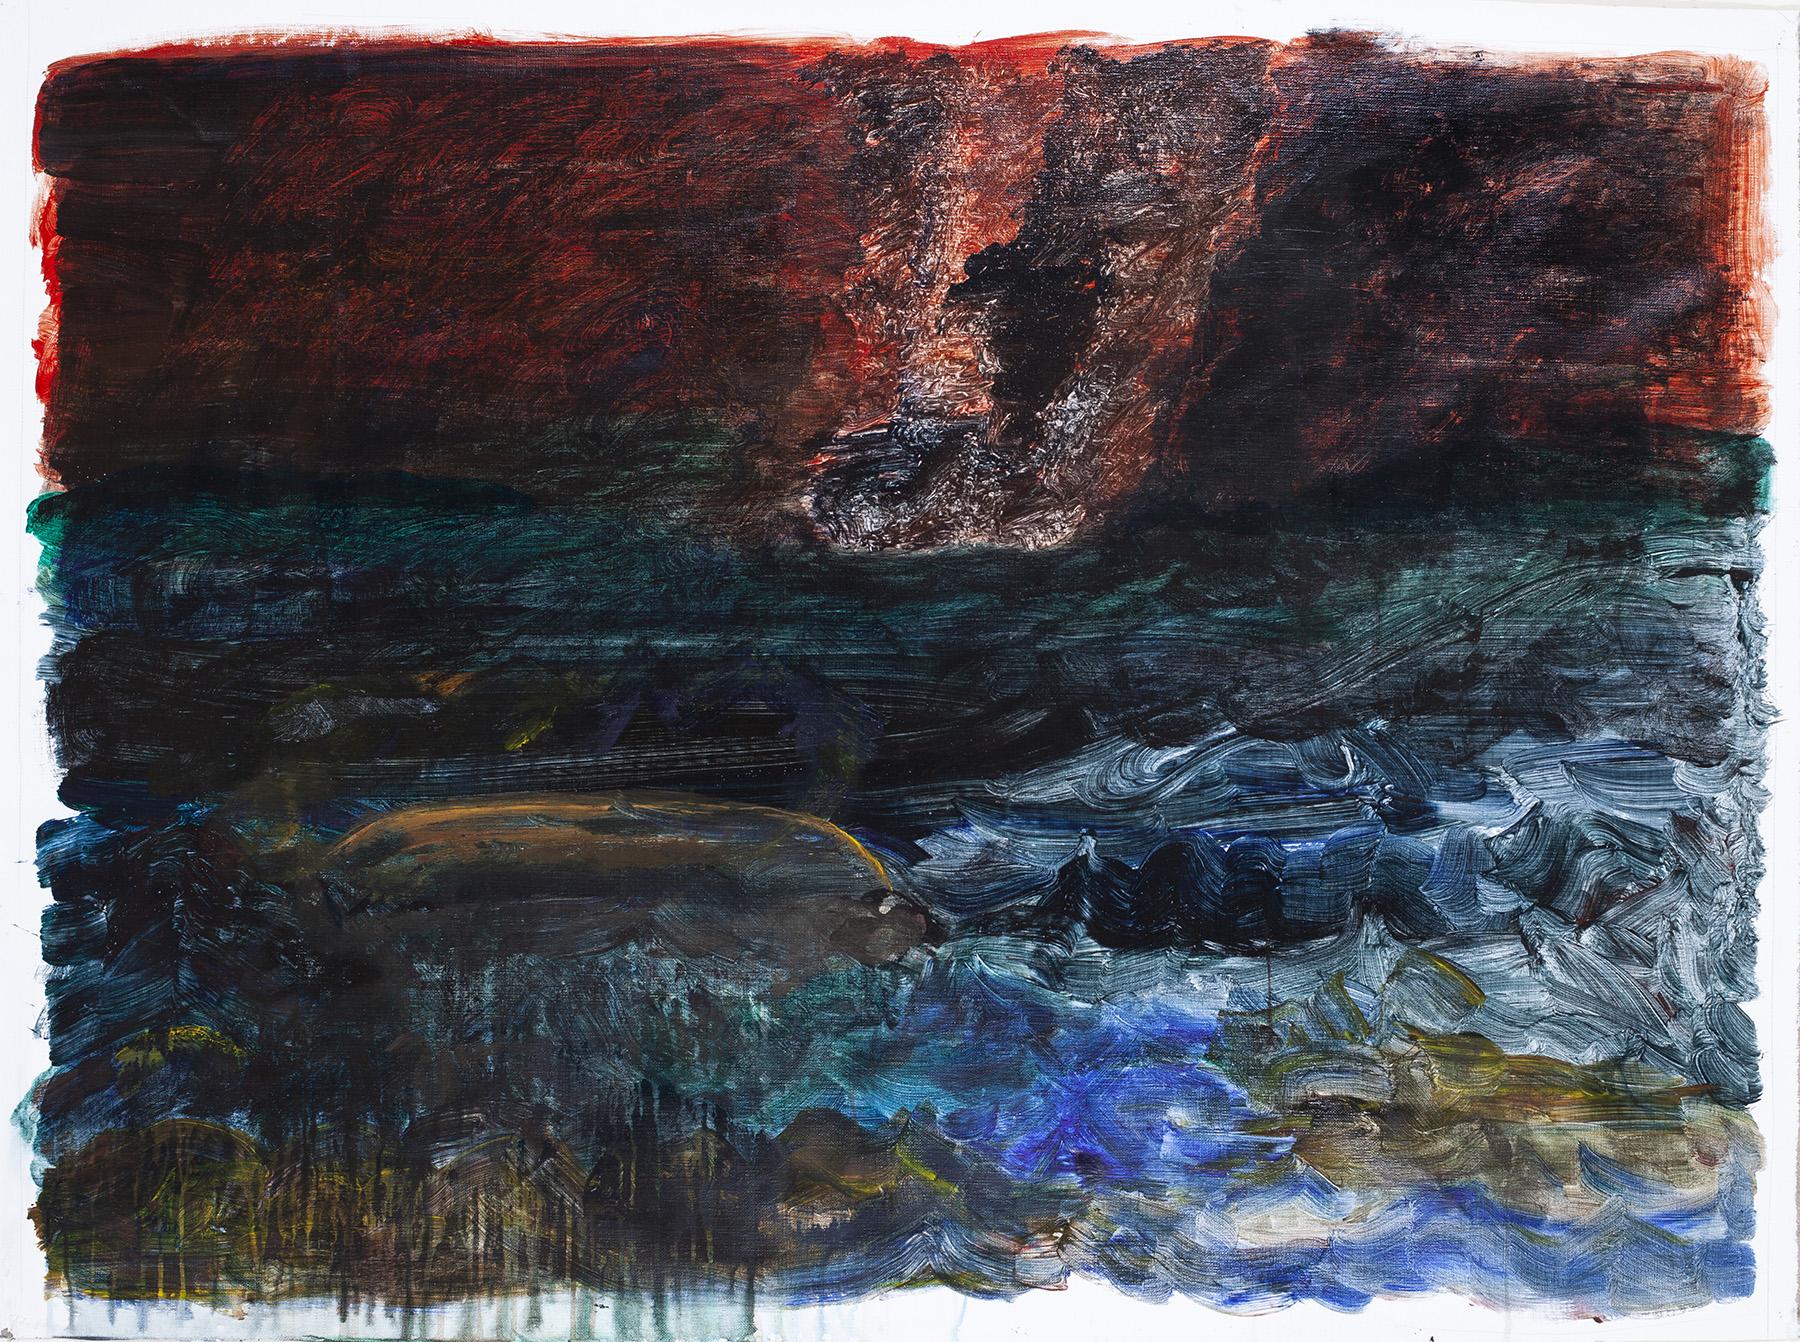 7.) Ono, Boat Sinking. 2018.  Acrylic on canvas, 38.25 in x 53 in (97.2 cm x 134.6 cm) copy.jpg